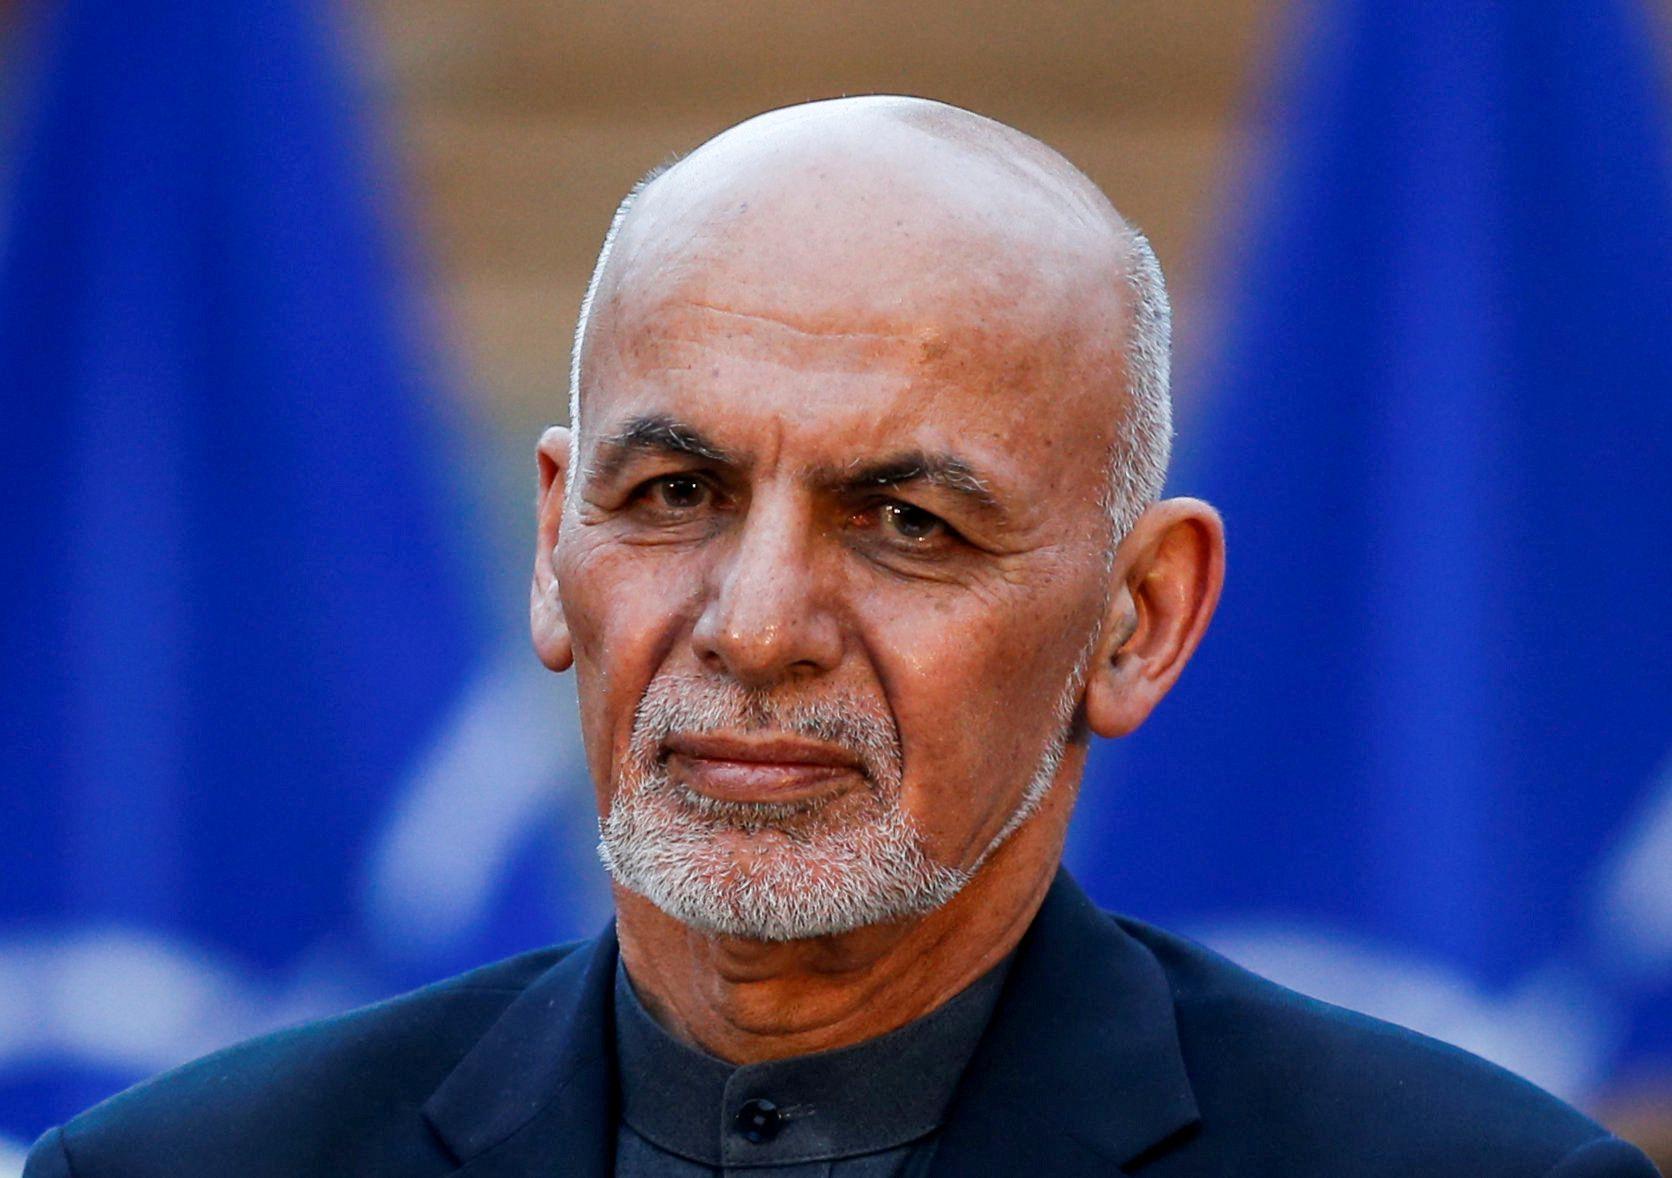 El presidente de Afganistán Ashraf Ghani REUTERS/Mohammad Ismail/File Photo